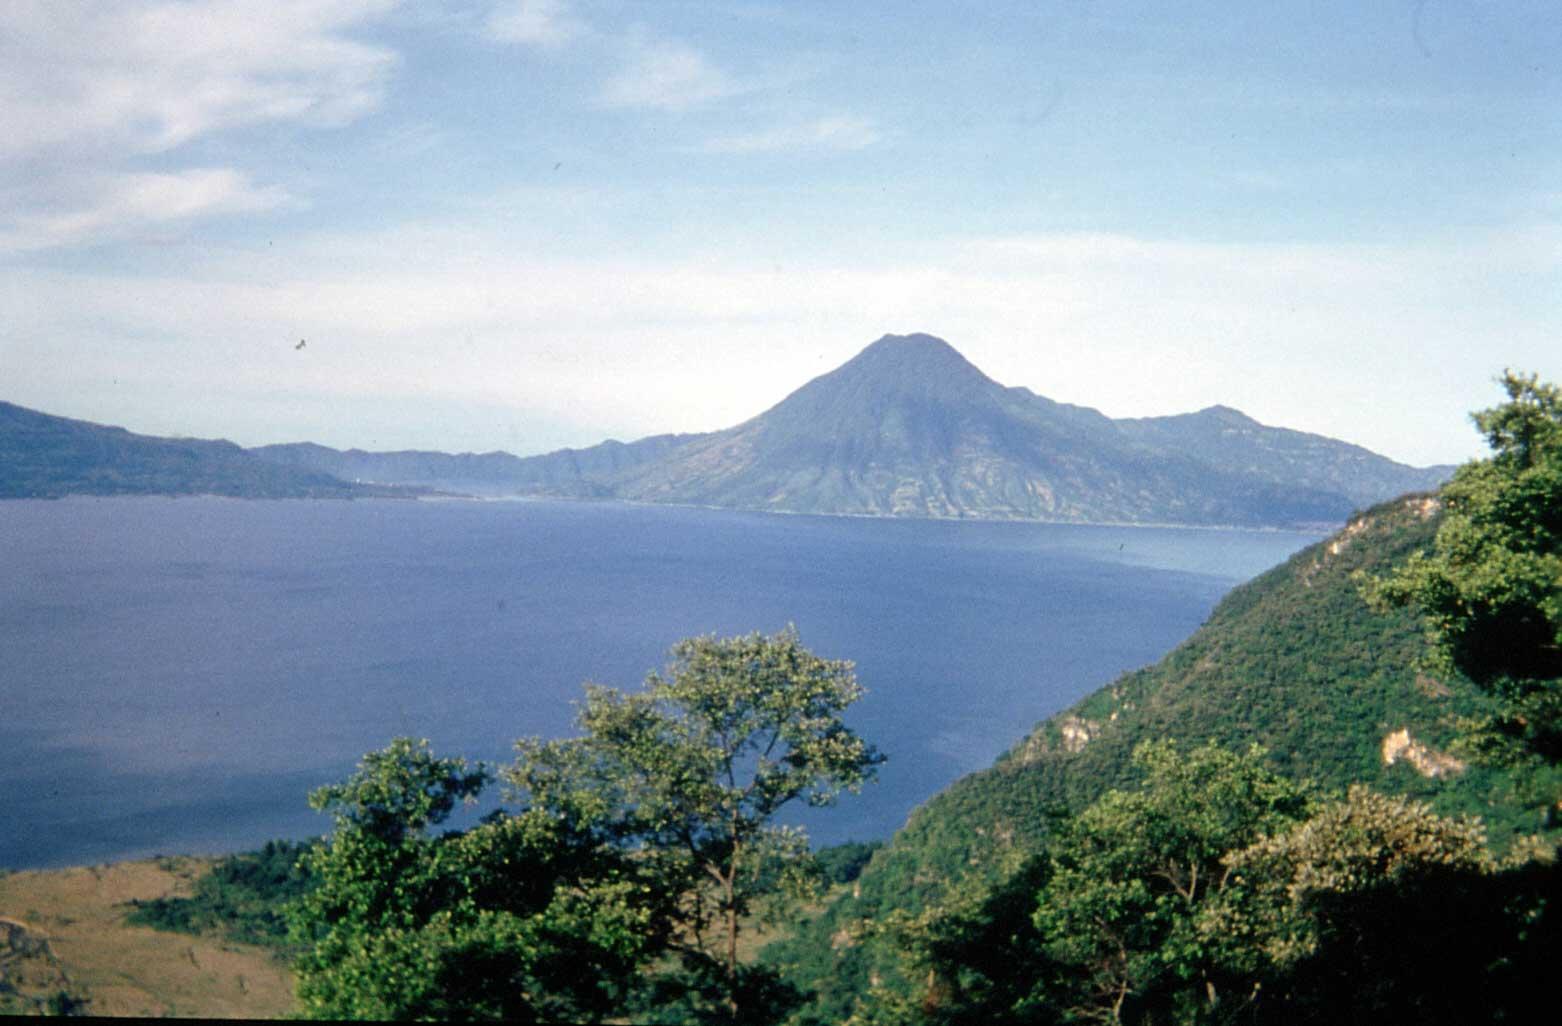 Guatemala N6HD/TG7